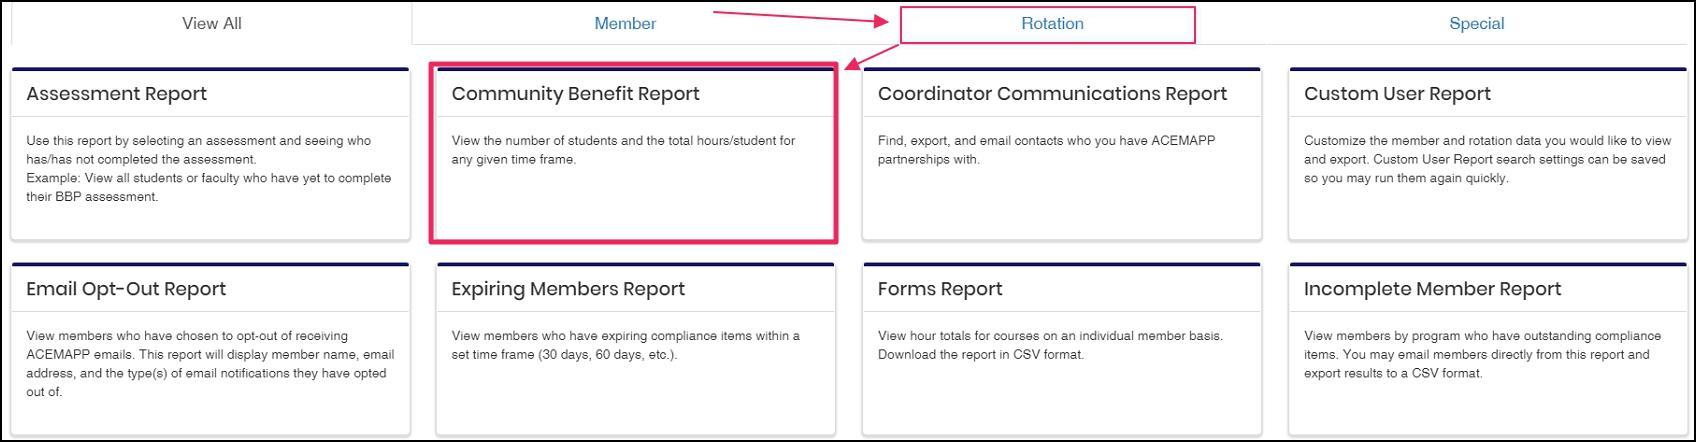 image Report tiles highlighting Community Benefit Report